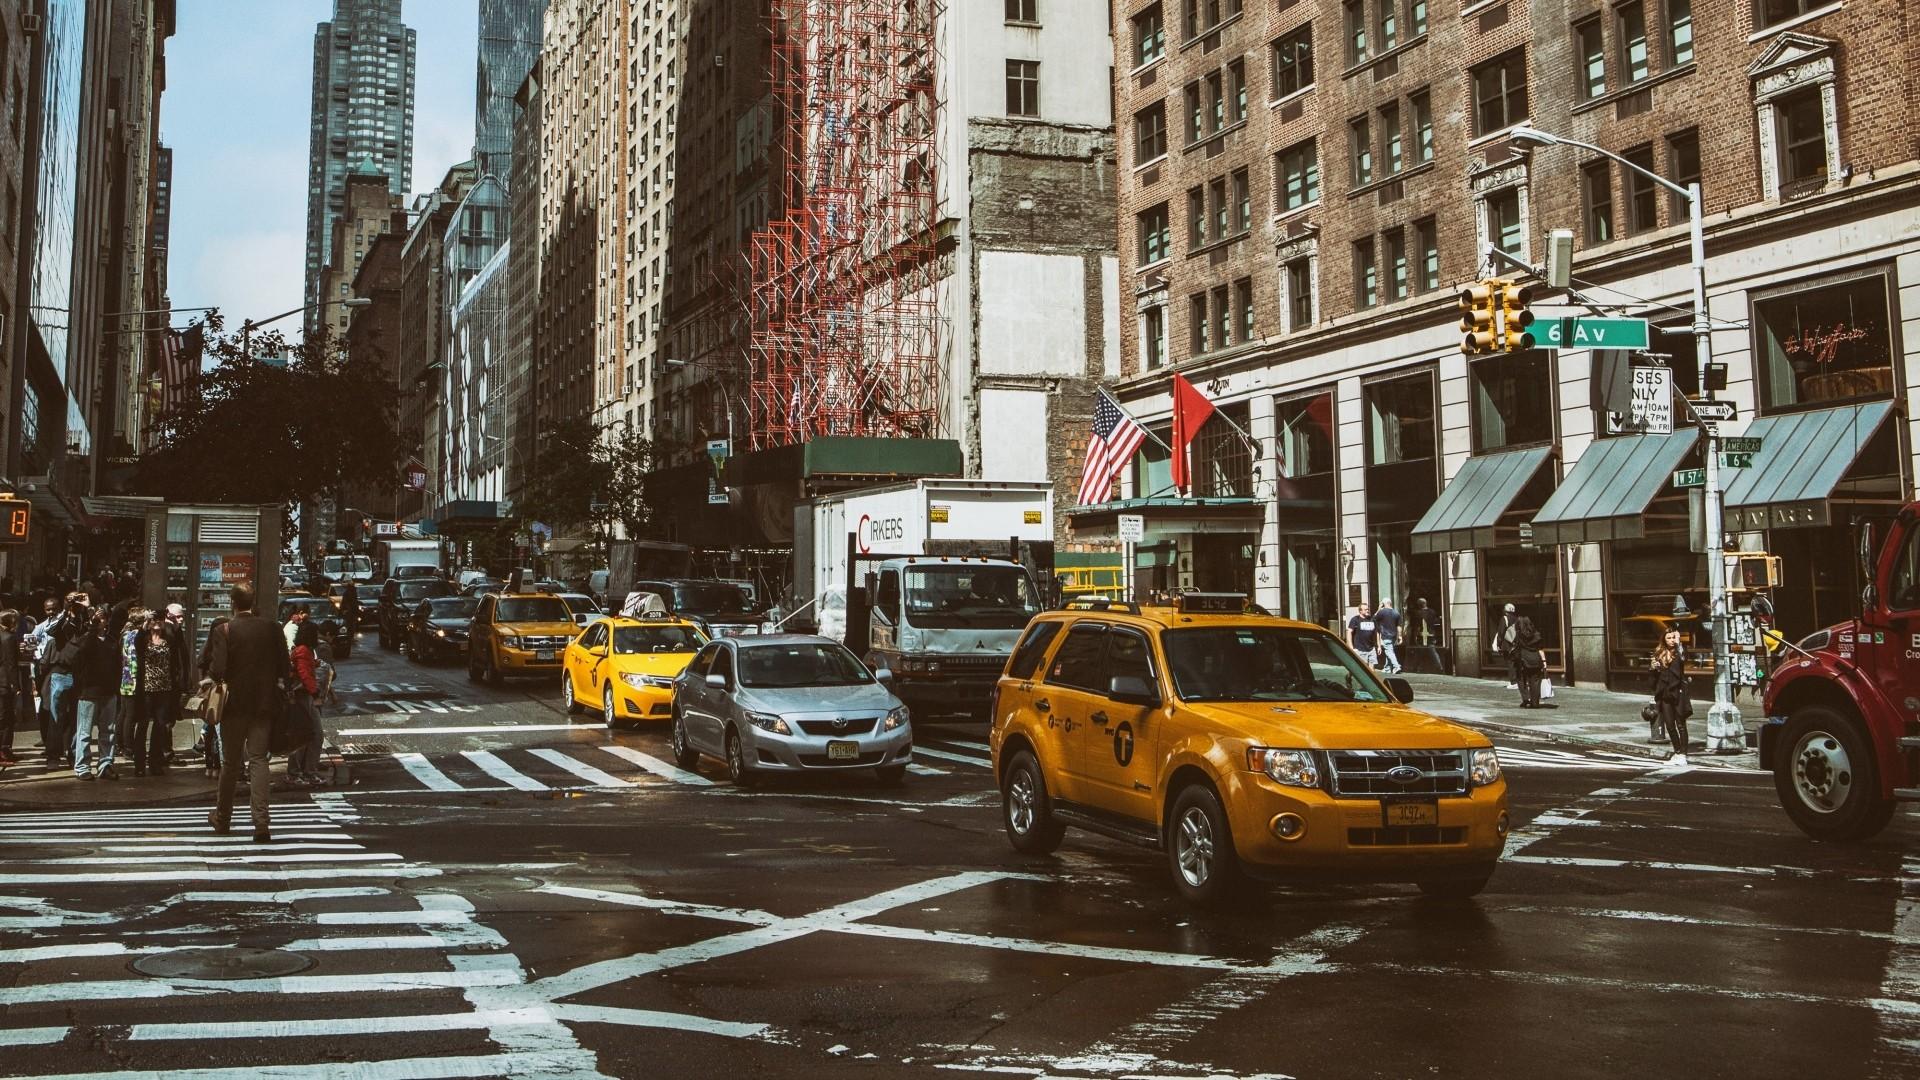 New York Street Background Wallpaper